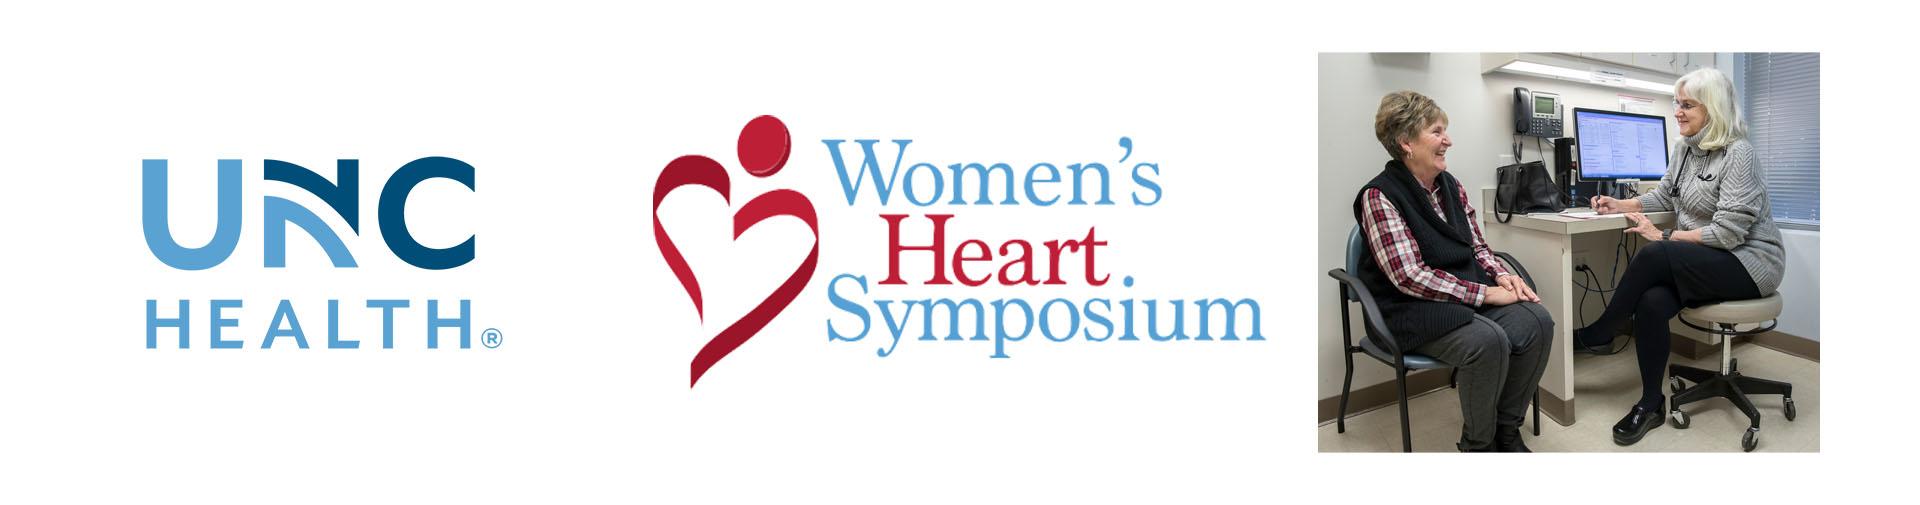 2021 Women's Heart Symposium